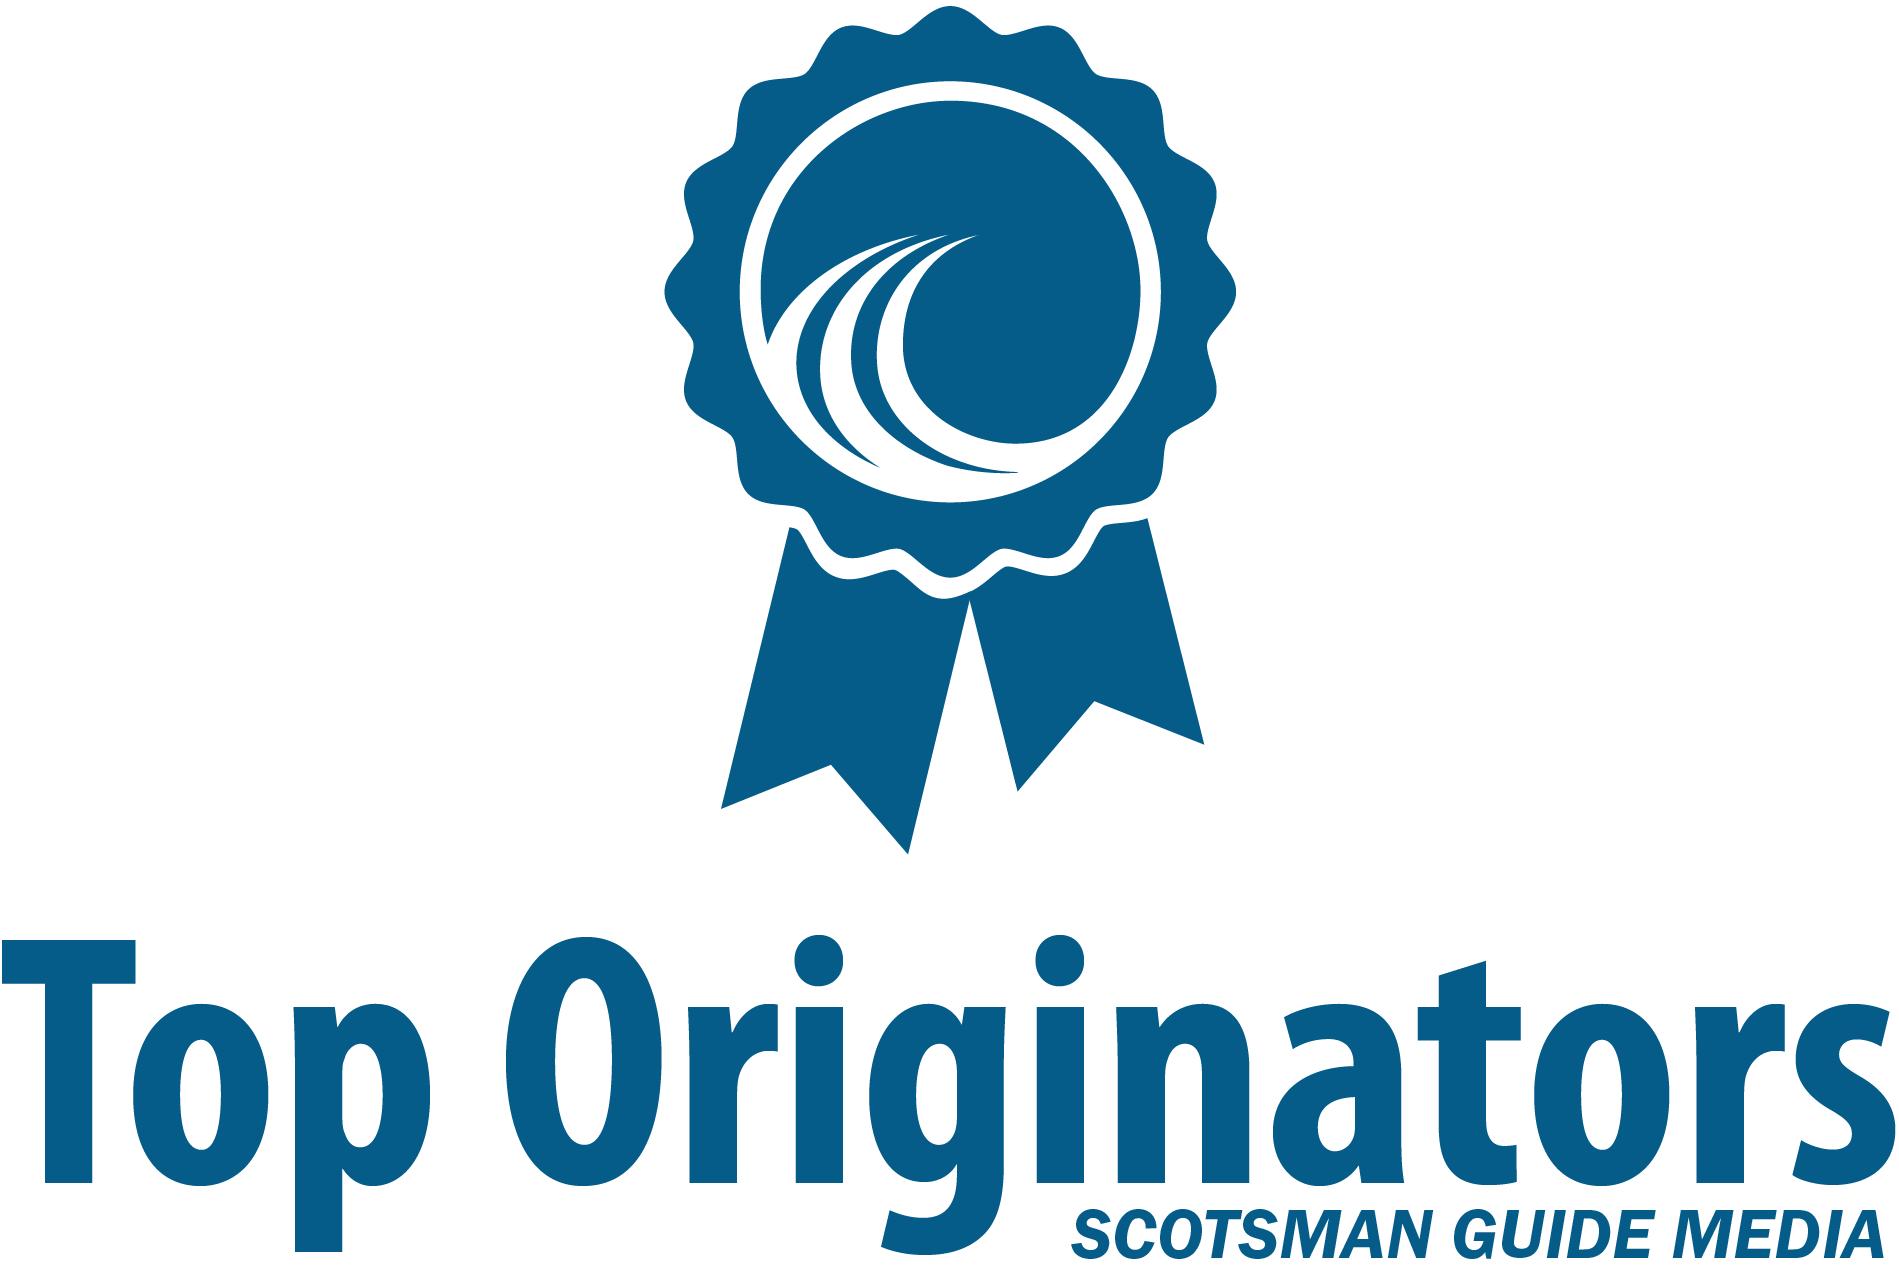 Scotsman Guide